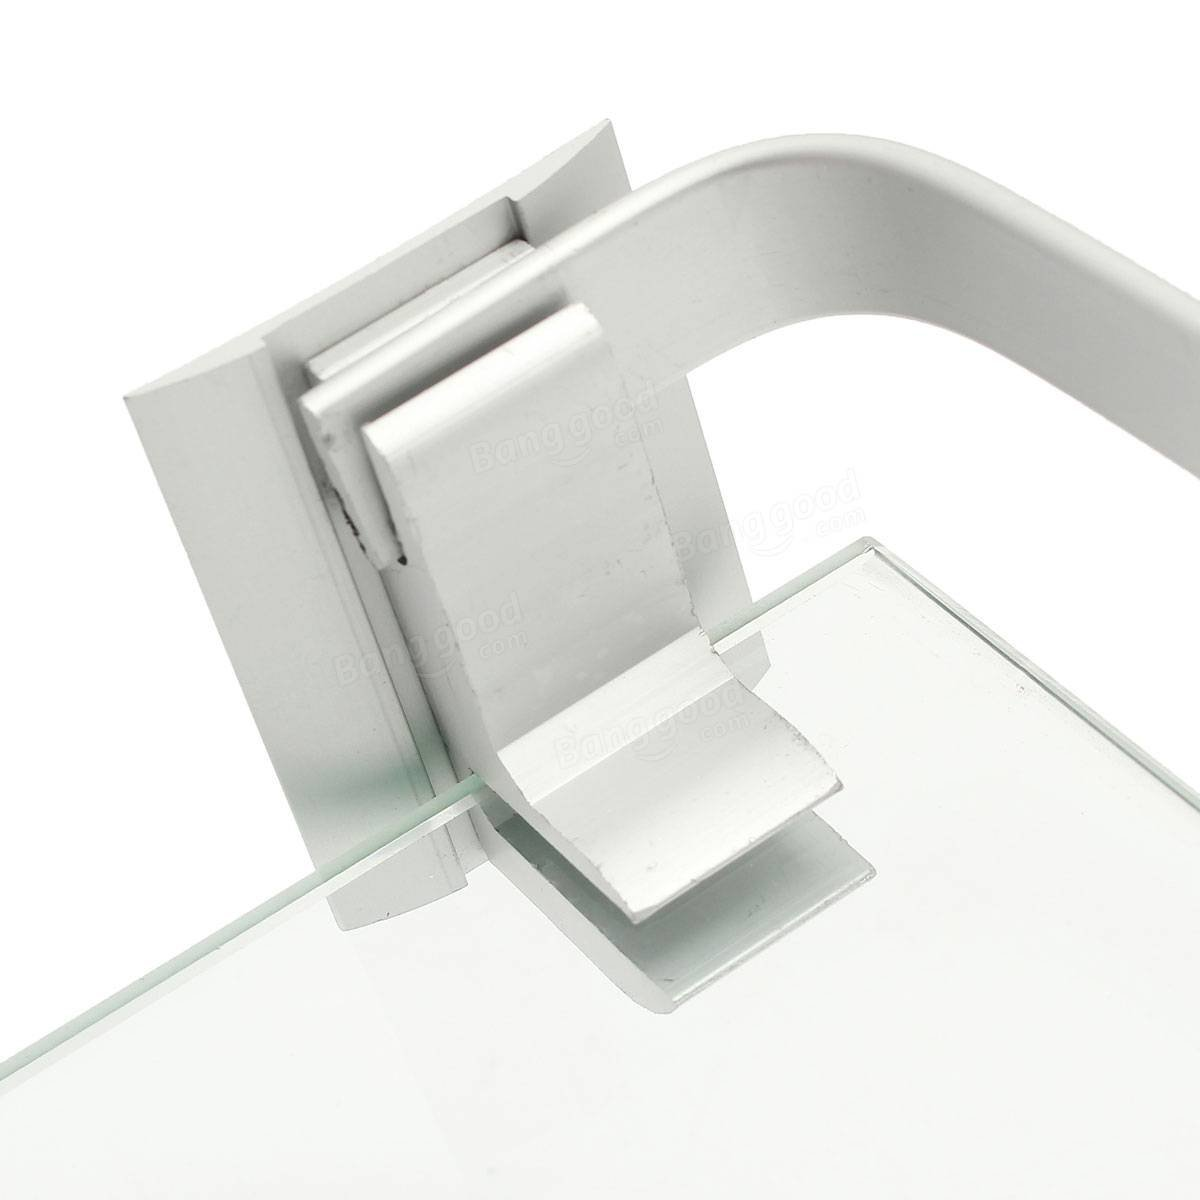 Lavatory Ledge - 60cm Armoured Glass Shower Caddy Bathroom Shelf Rectangle Wall Mounted Sundry Stand - John Facility Privy - 1PCs